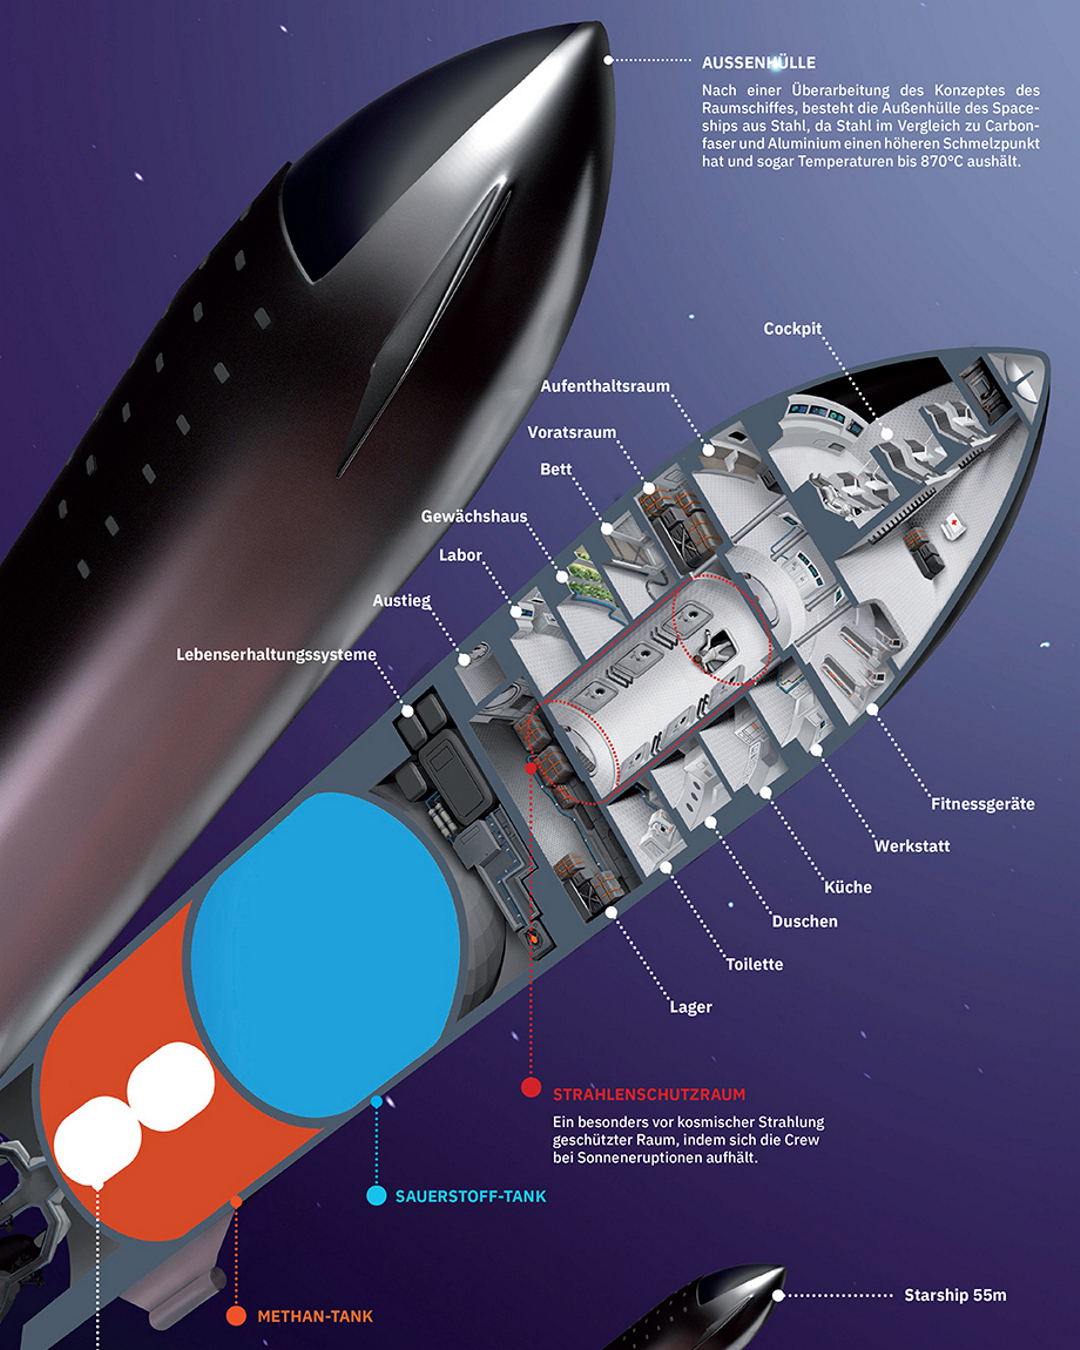 SpaceX%2BStarship%2Bcutaway%2Bdiagram%2B